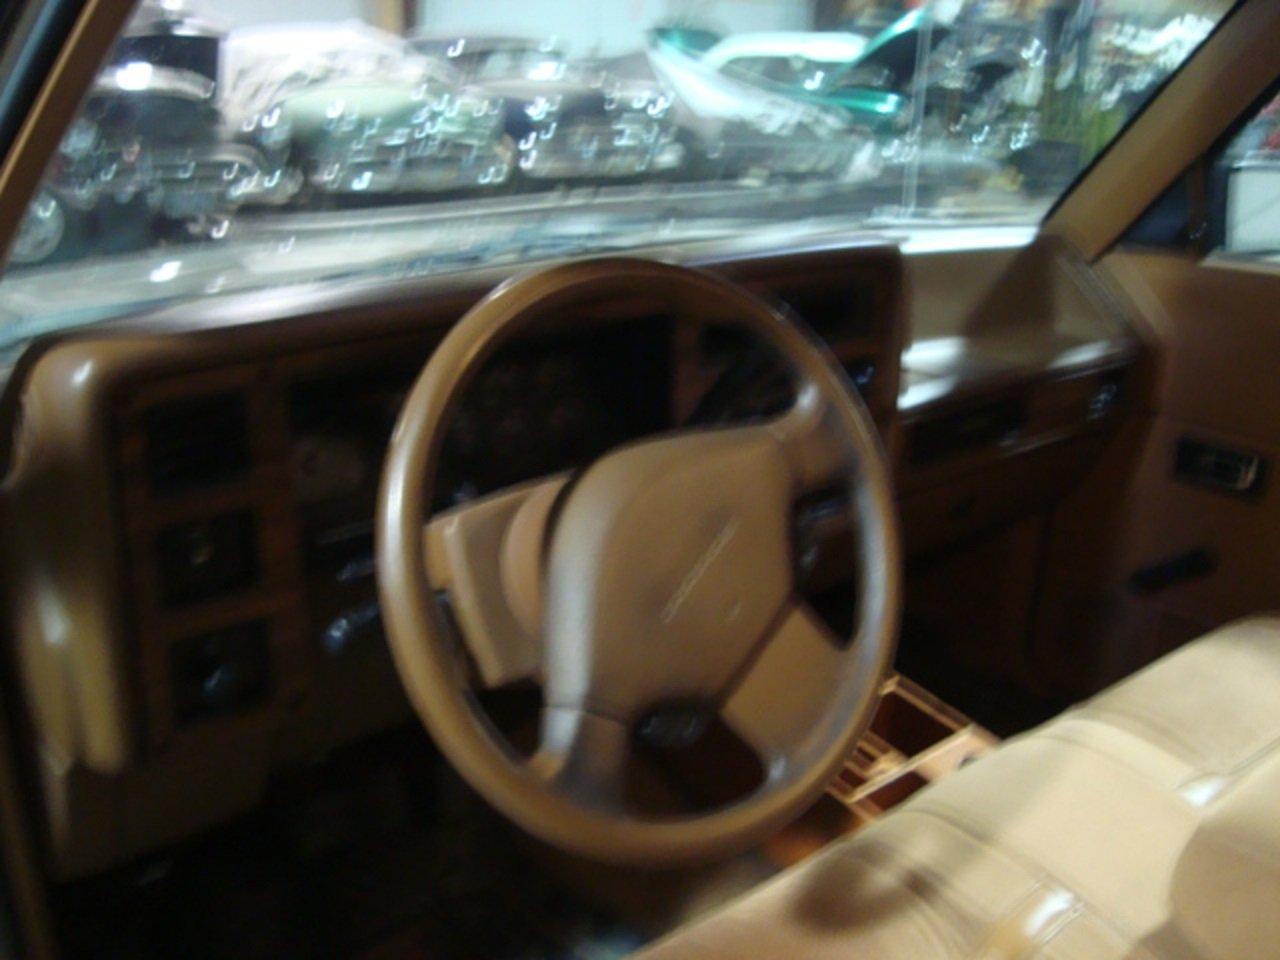 1992 Dodge Dakota Pickup For Sale (picture 6 of 6)